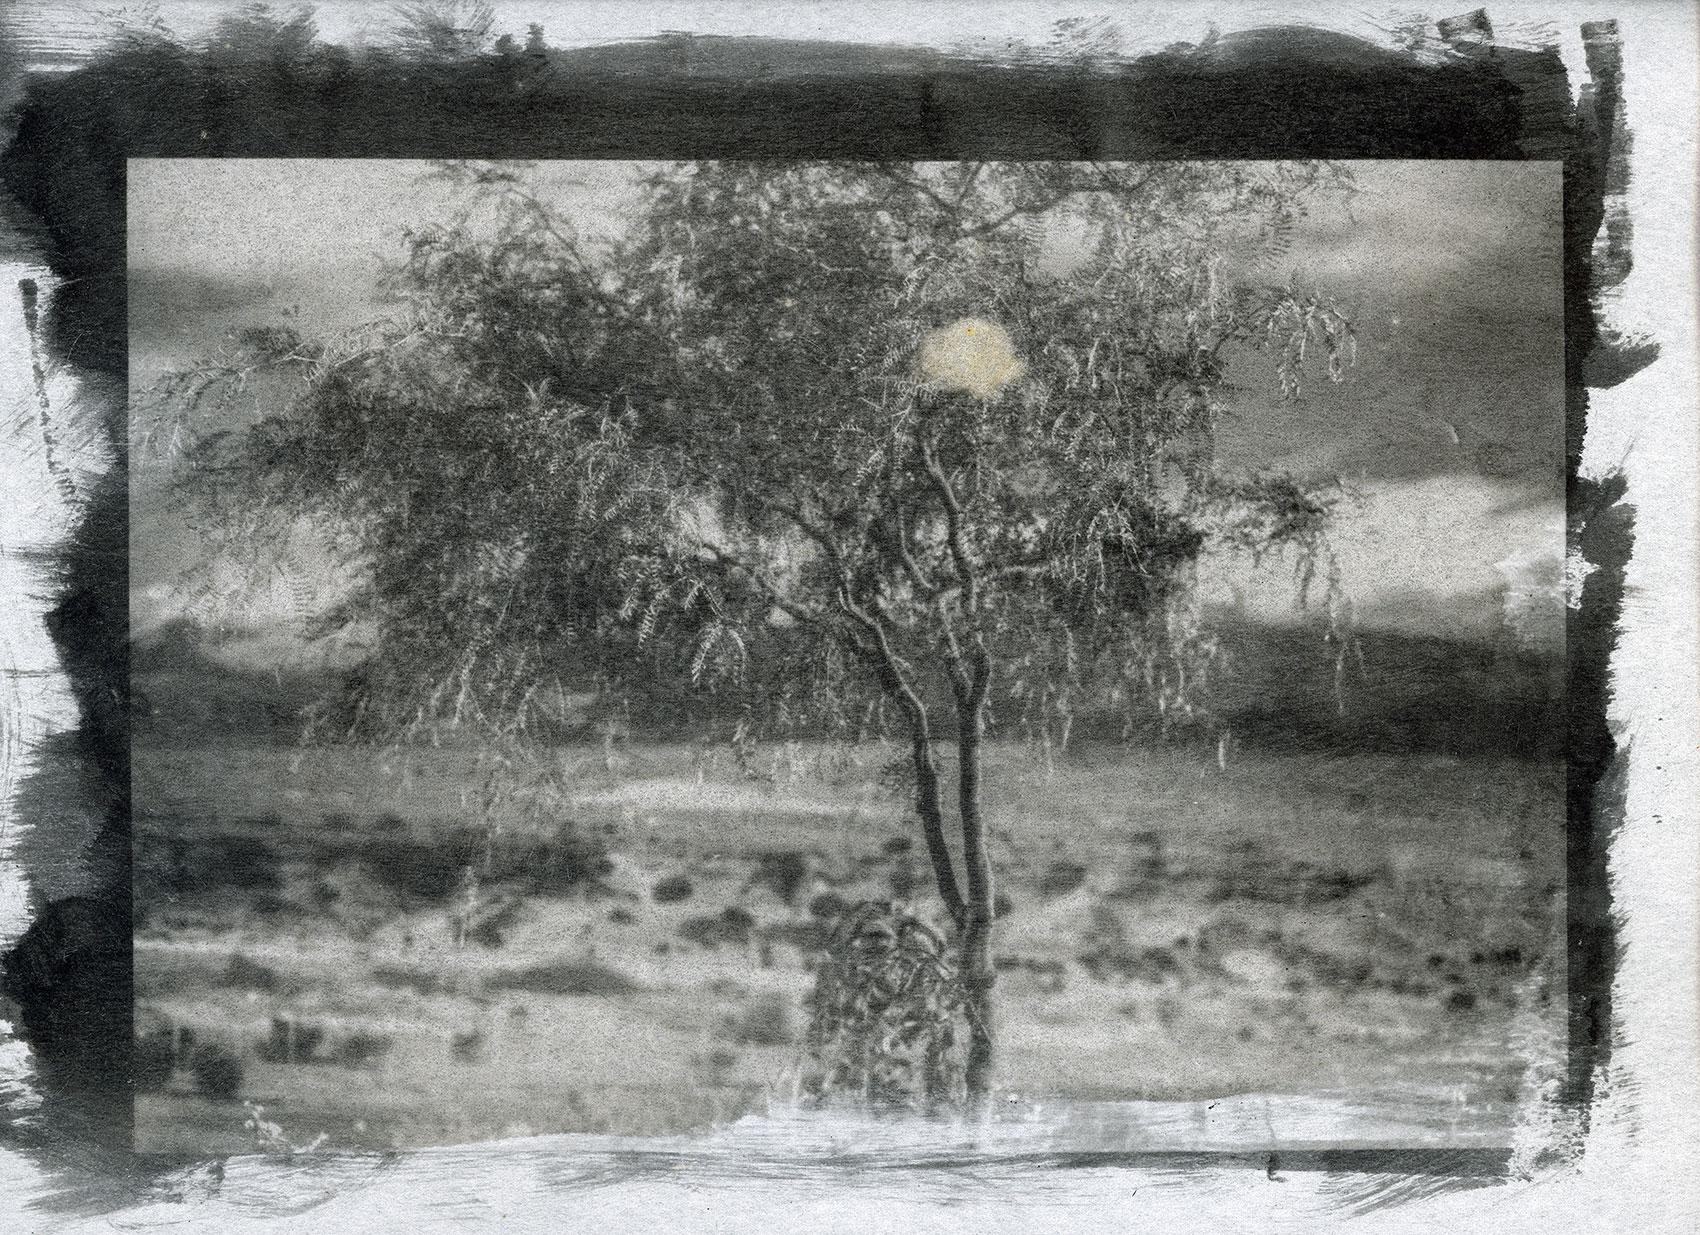 Window on the Desert 1 - Night Life| Stefano Paradiso - Photographer